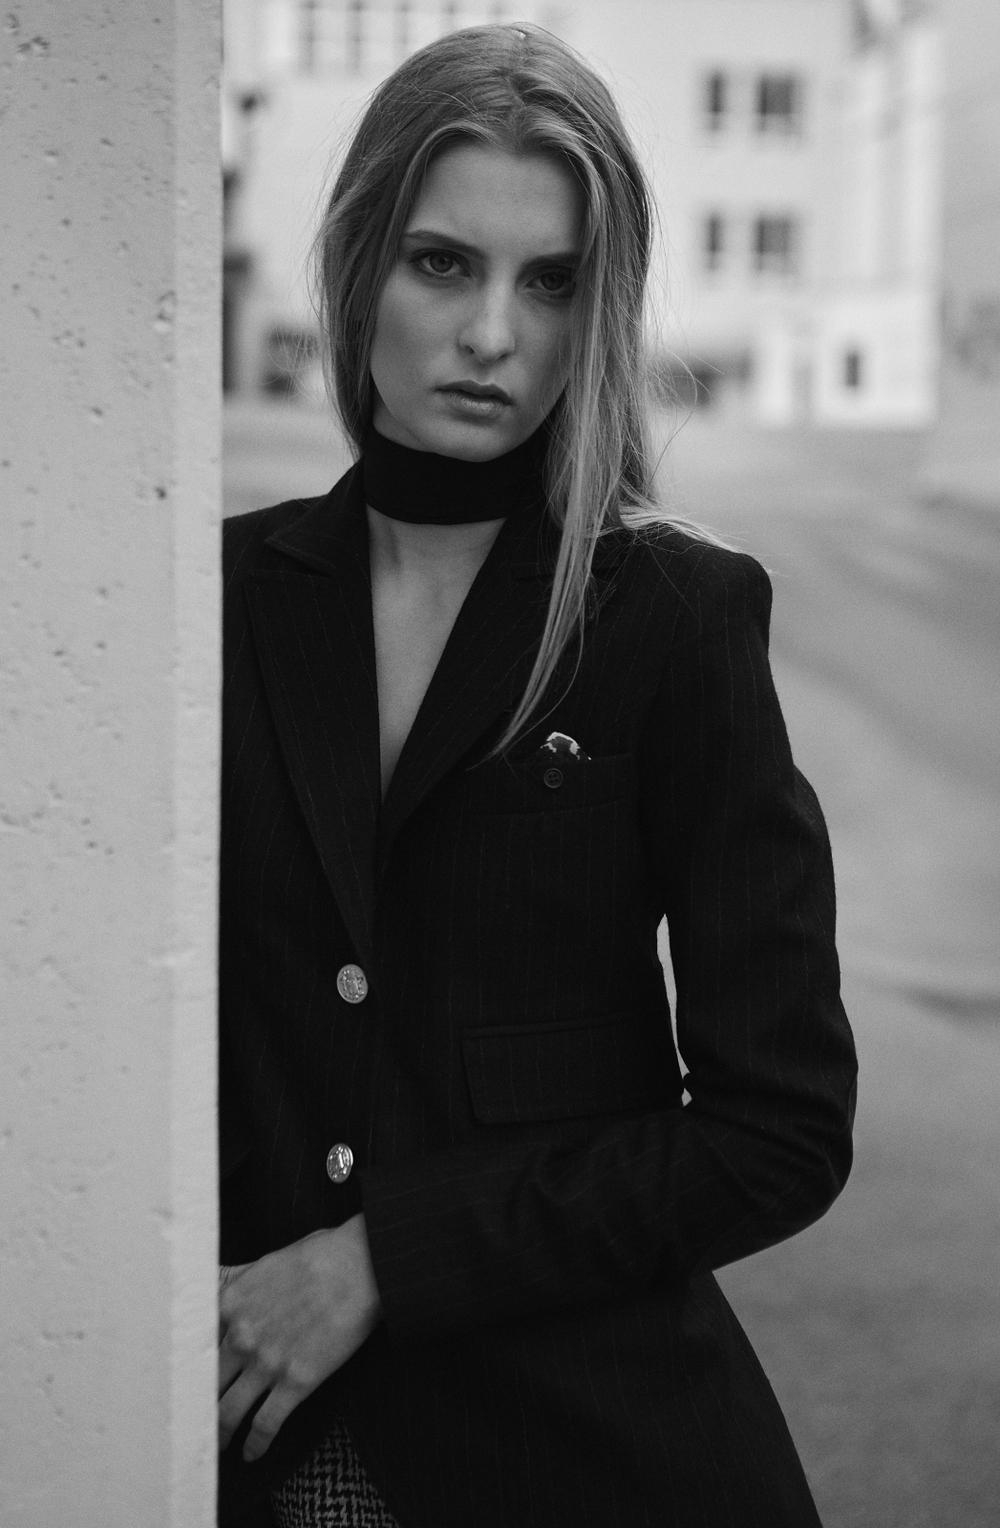 Vancouver Canadian Fashion Photographer KENTON 6.jpg